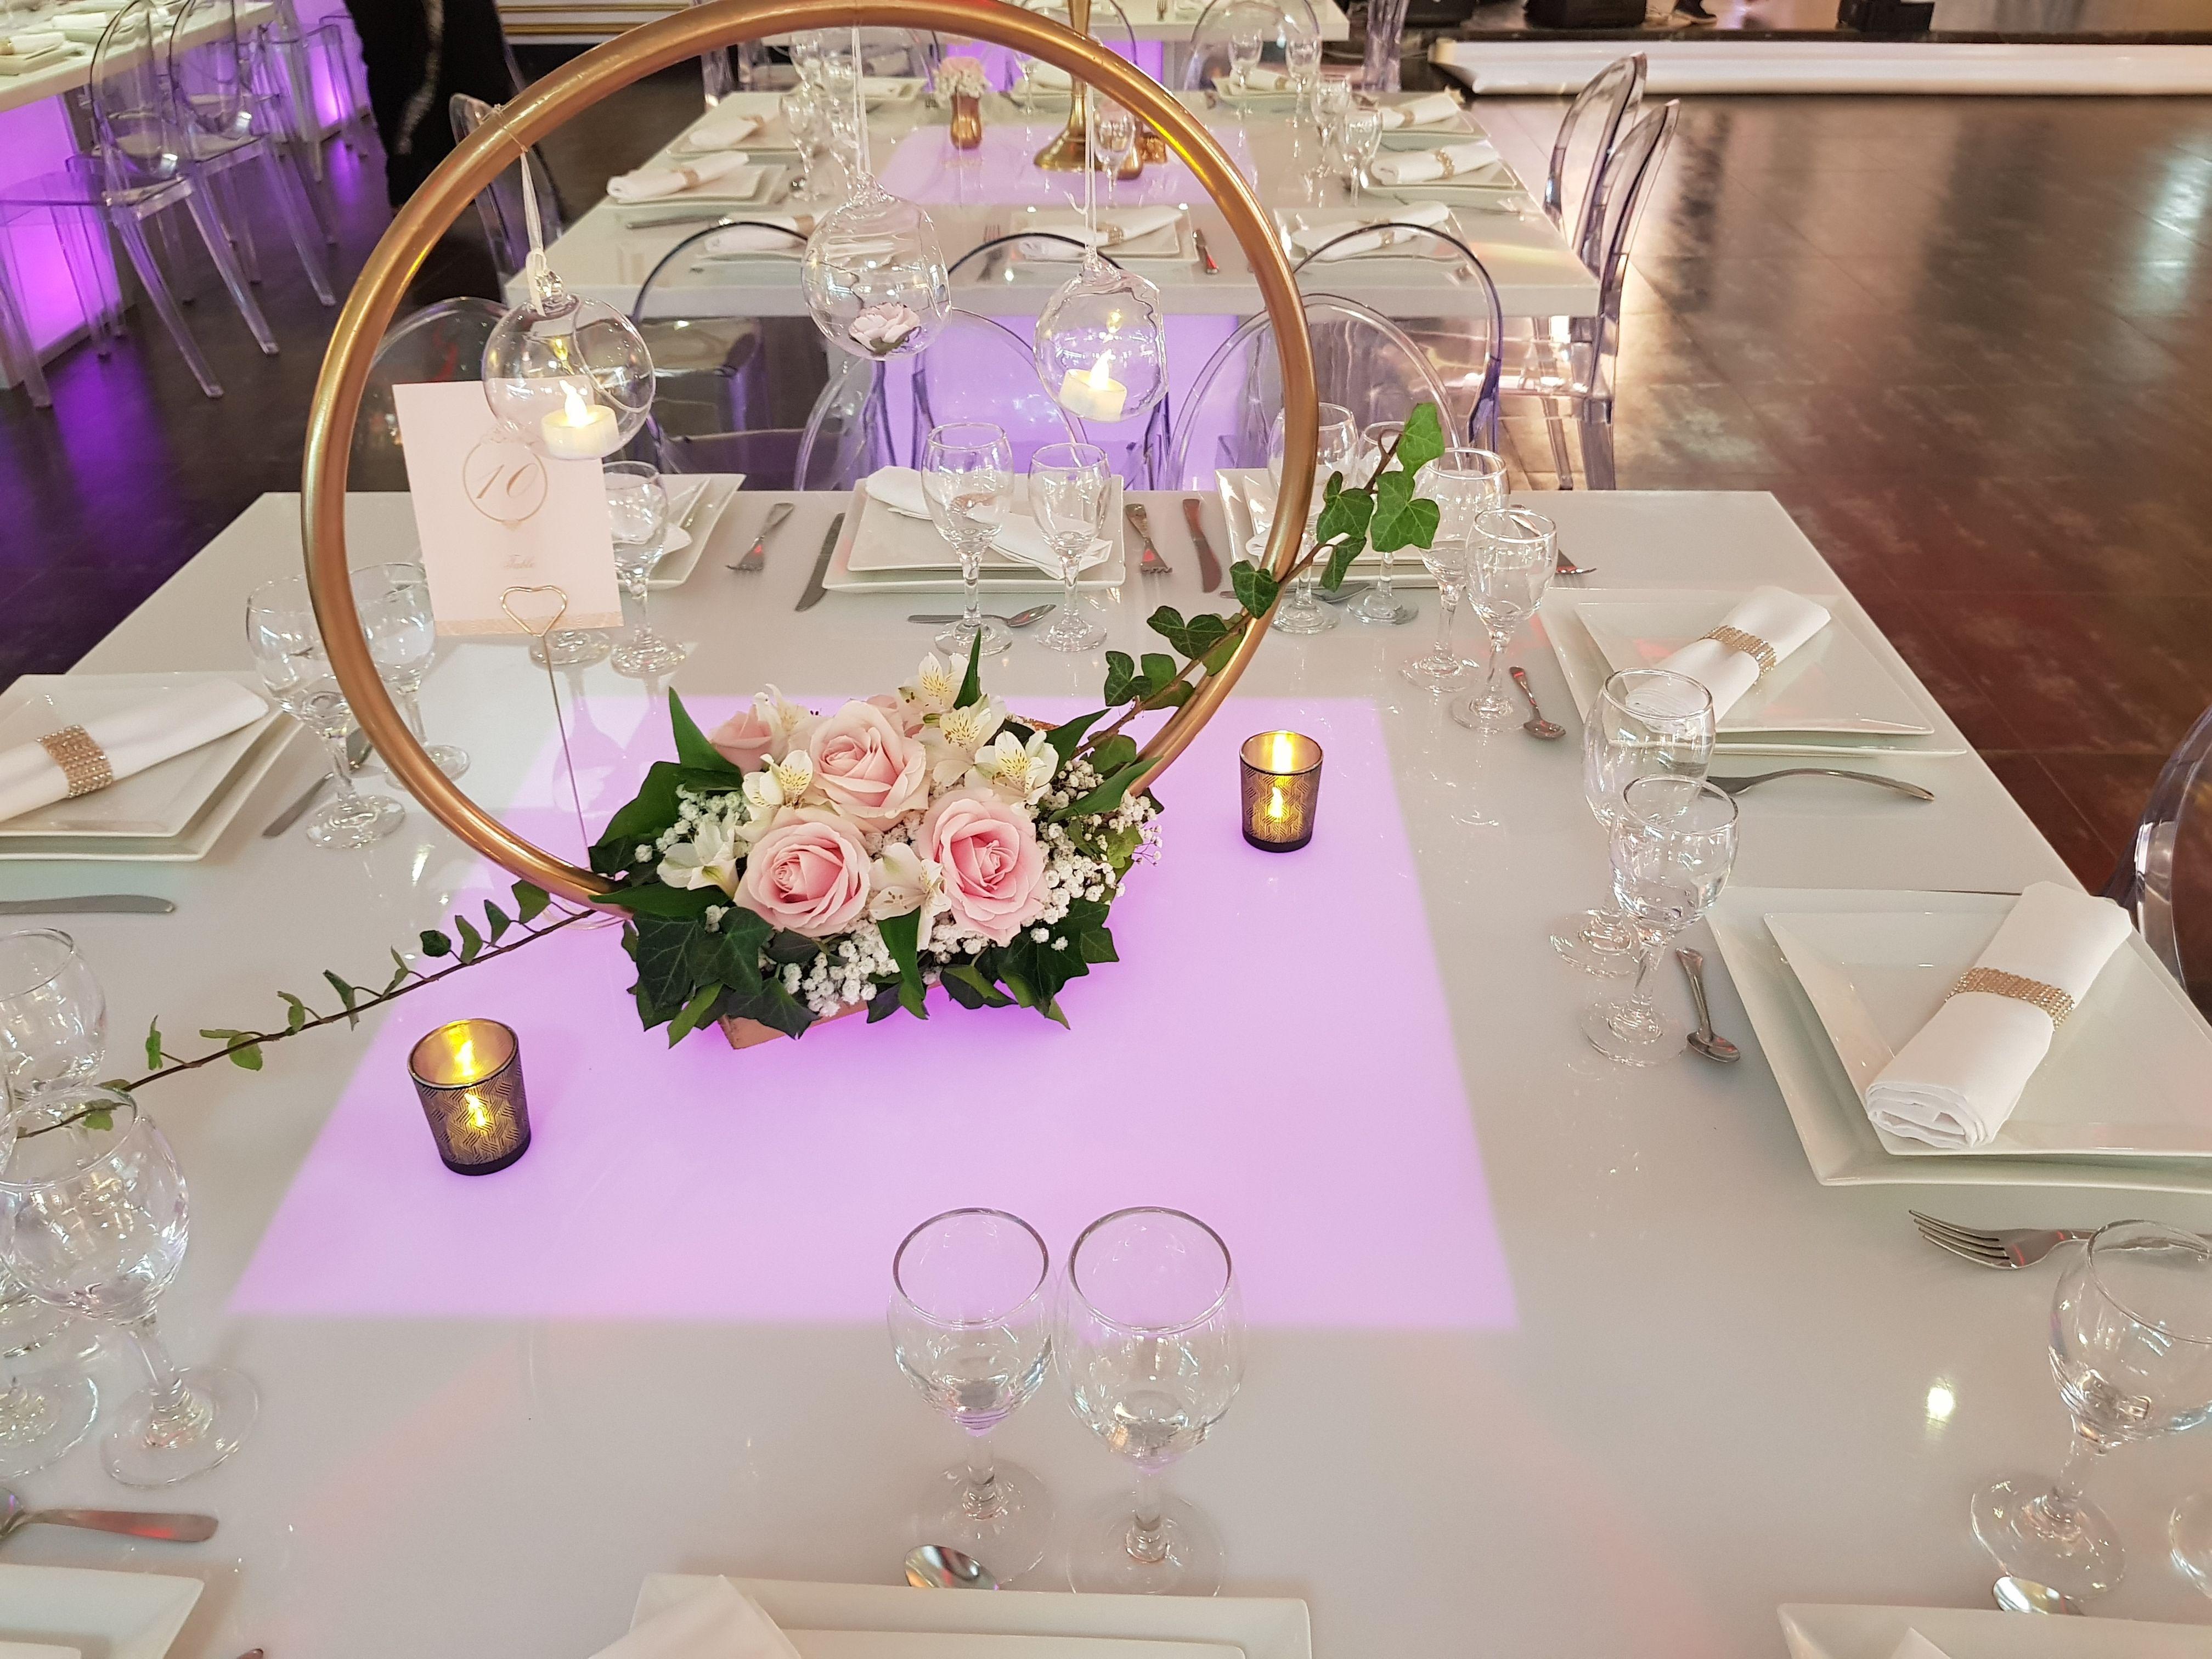 Hula Hoop Turned Centerpiece Artofit Cheap Wedding Table Centerpieces Diy Wedding Decorations Wedding Table Centerpieces